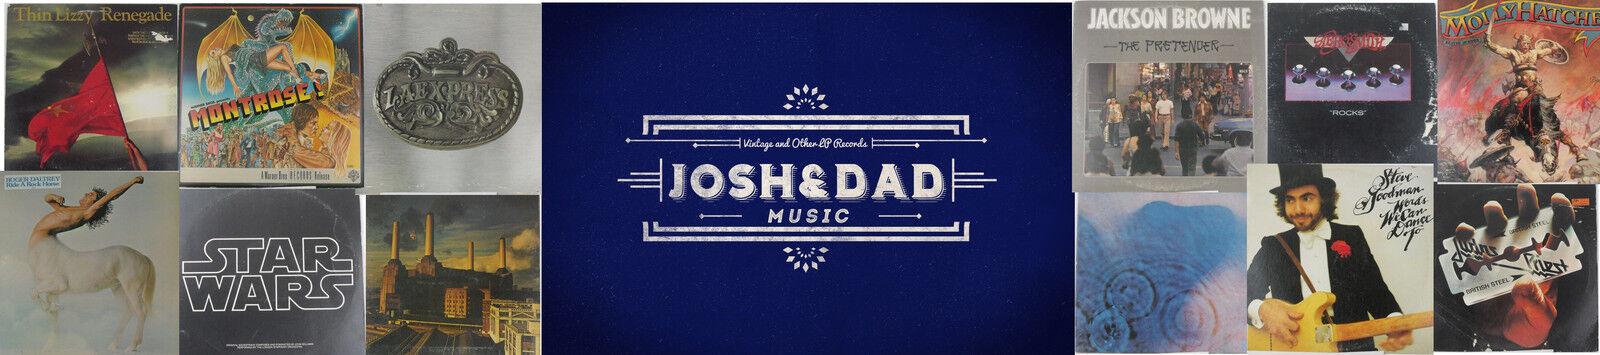 Josh&Dad Music